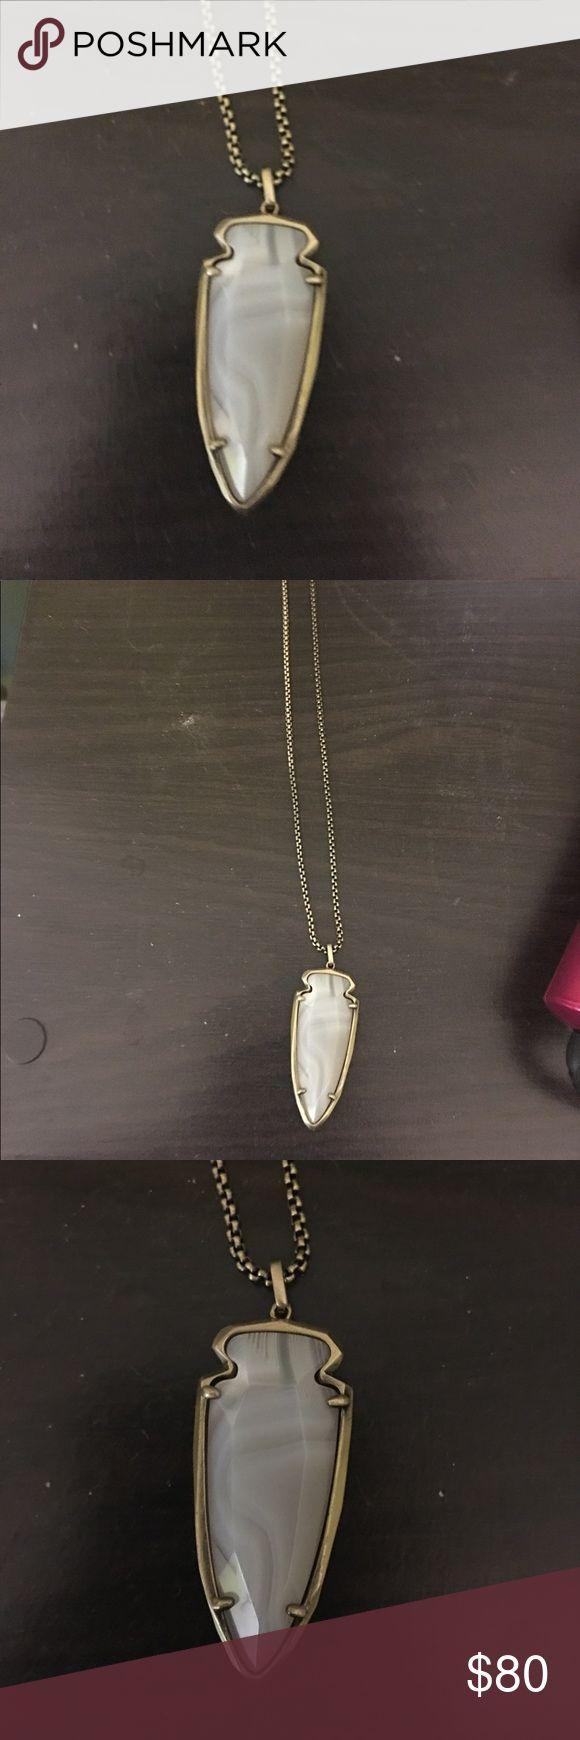 Kendra Scott Necklace Grey/White marble necklace Kendra Scott Jewelry Necklaces